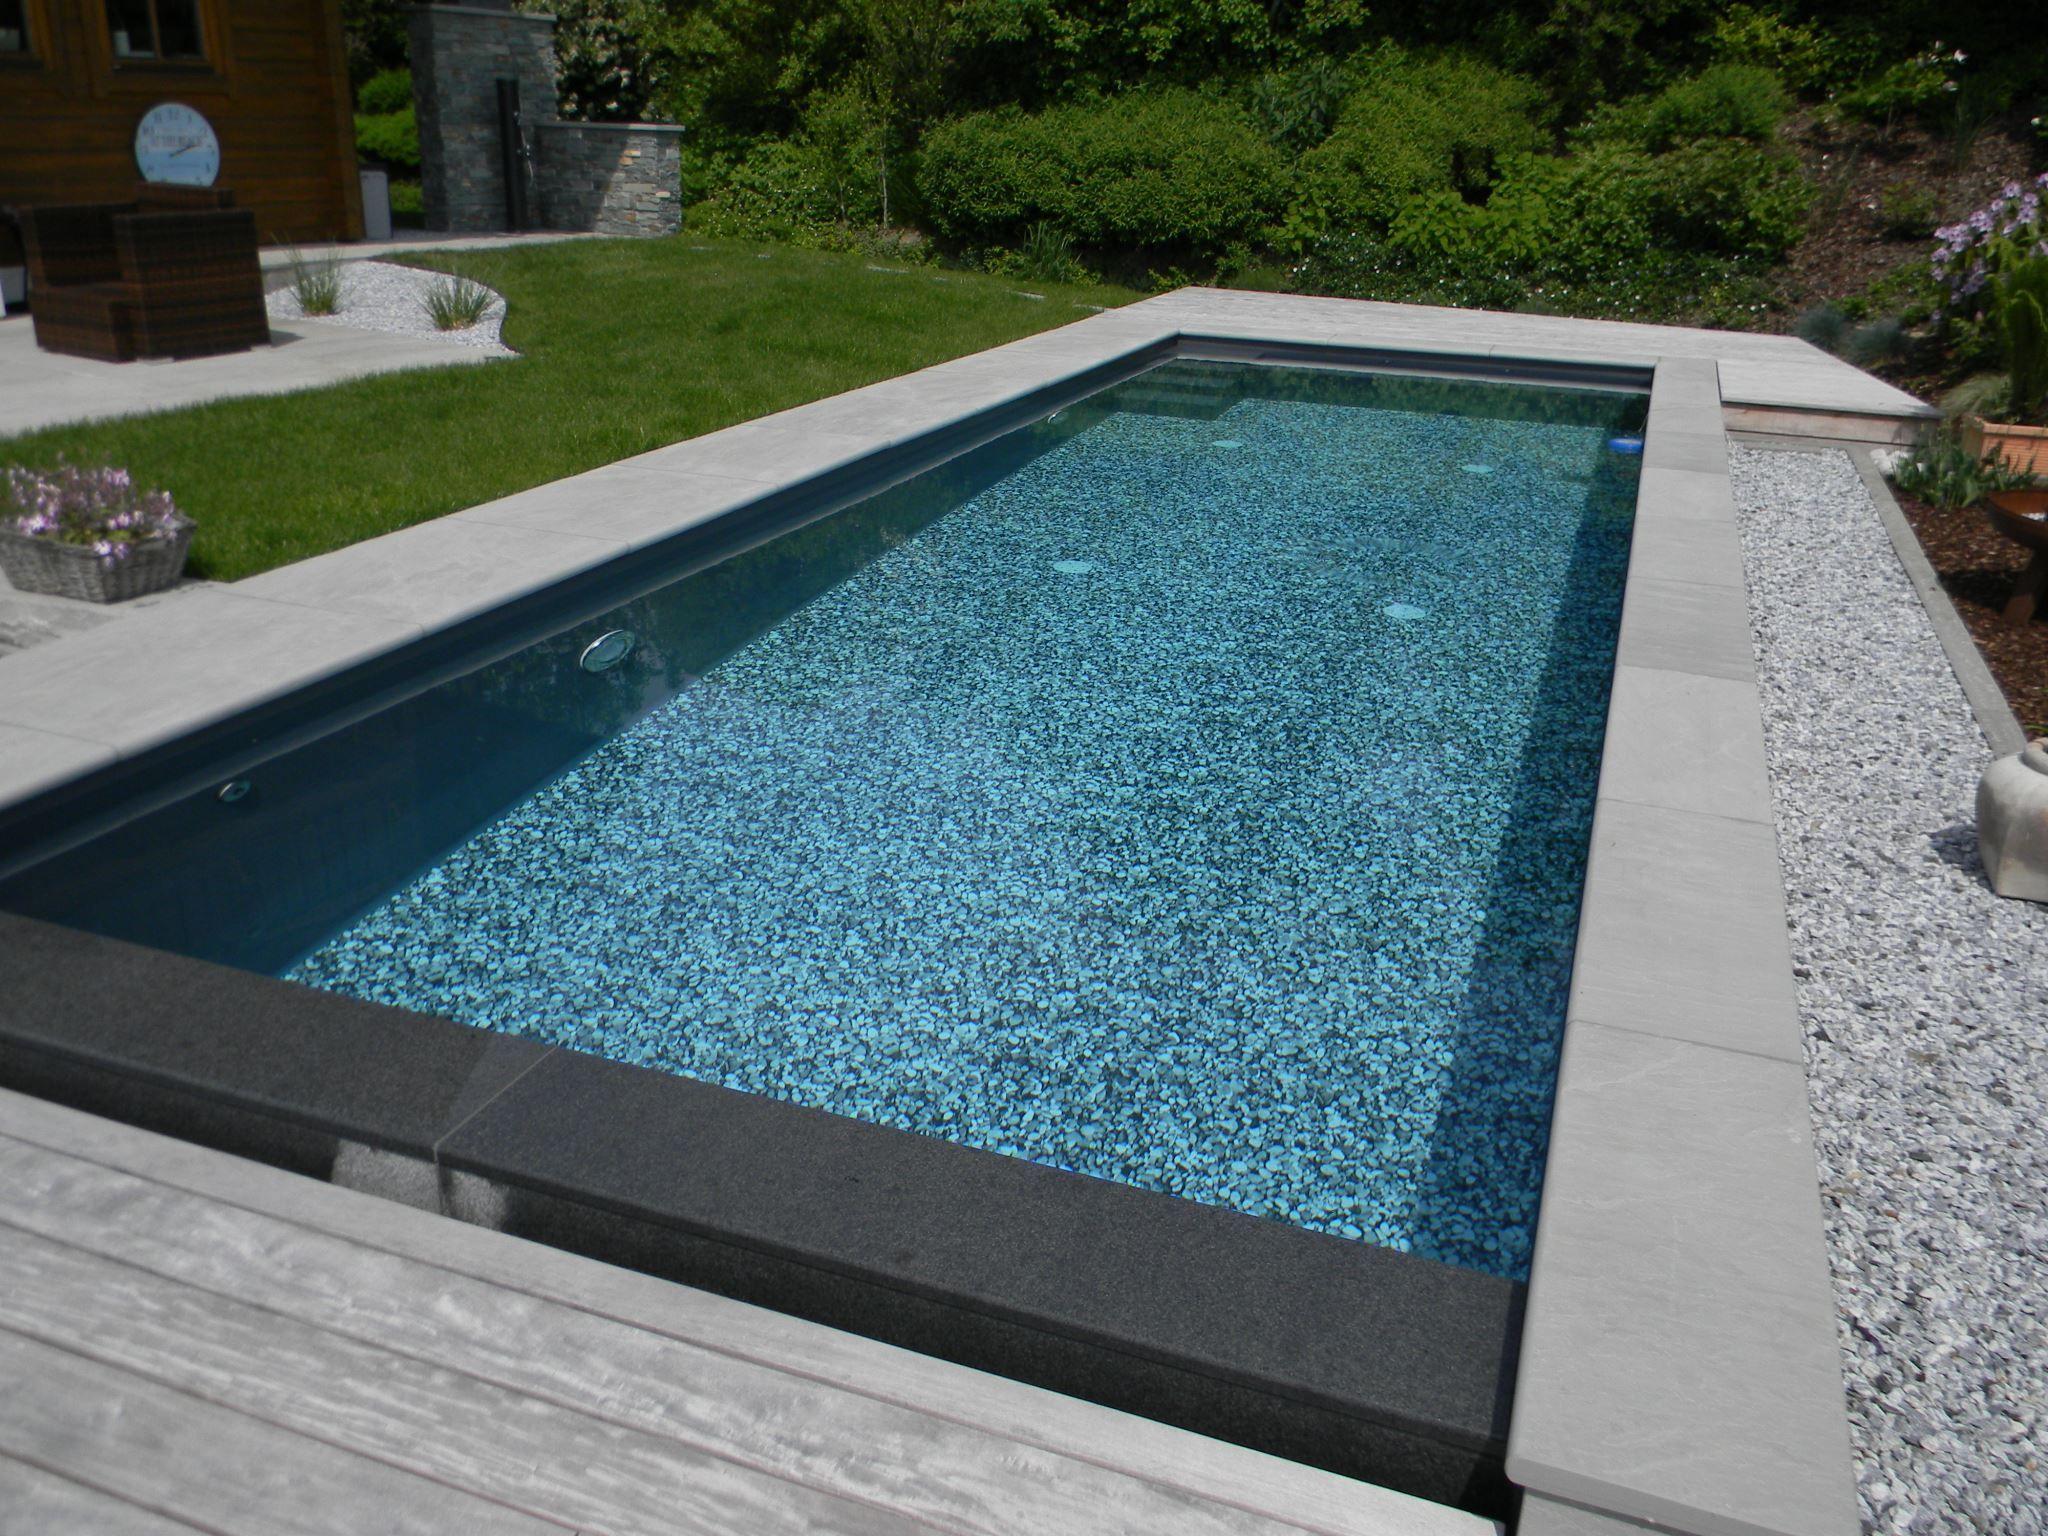 Pool Gerades Stuck Sandstein Kandla Grey 100 35 3 Cm Kalibriert Stein Co In 2020 Pool Pool Umrandung Poolumrandung Stein